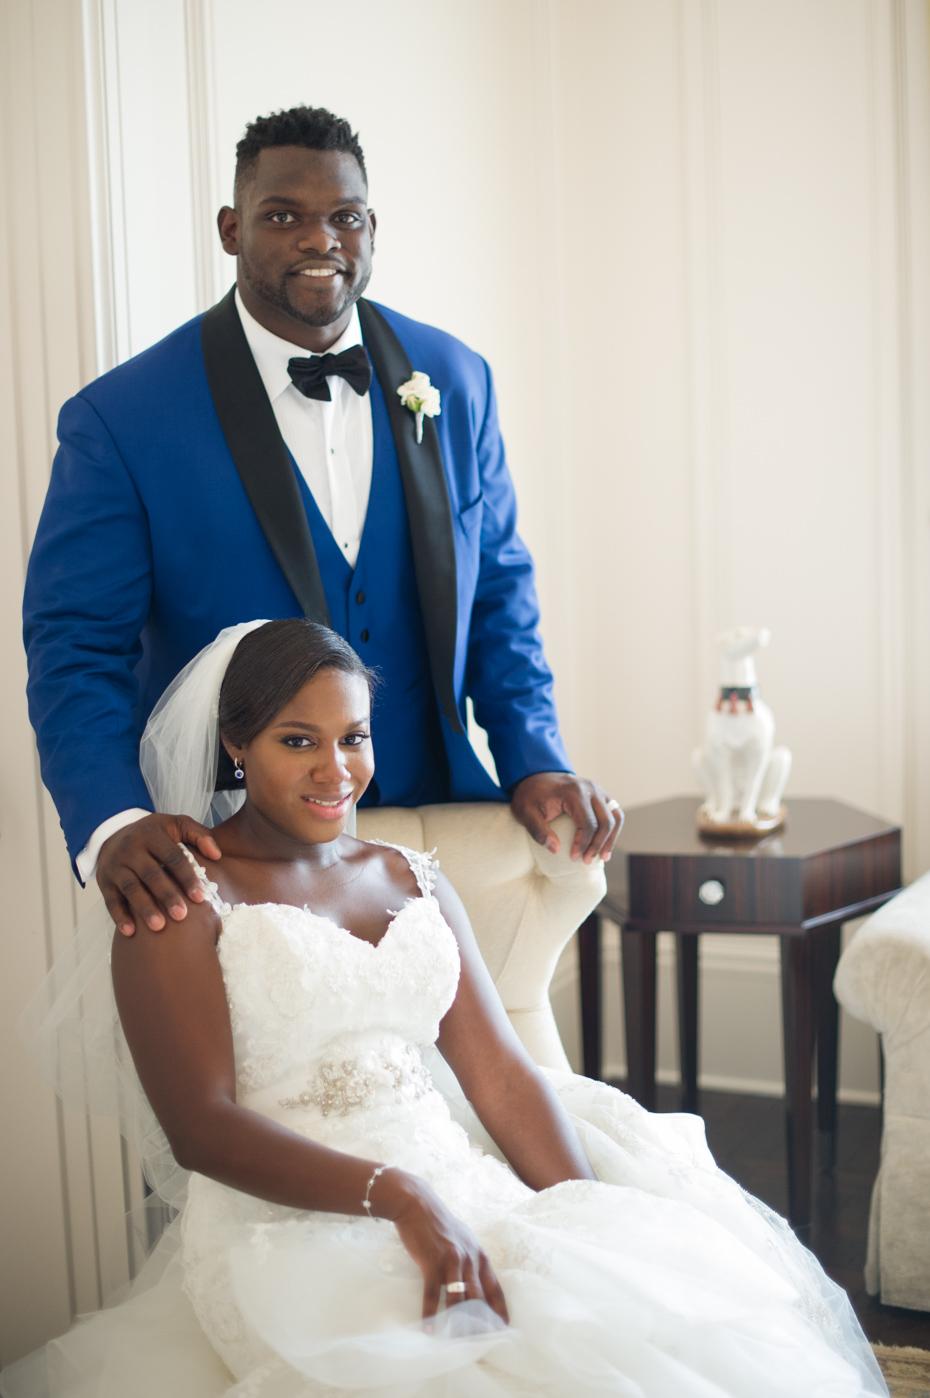 St. Regis Atlanta Wedding Photos